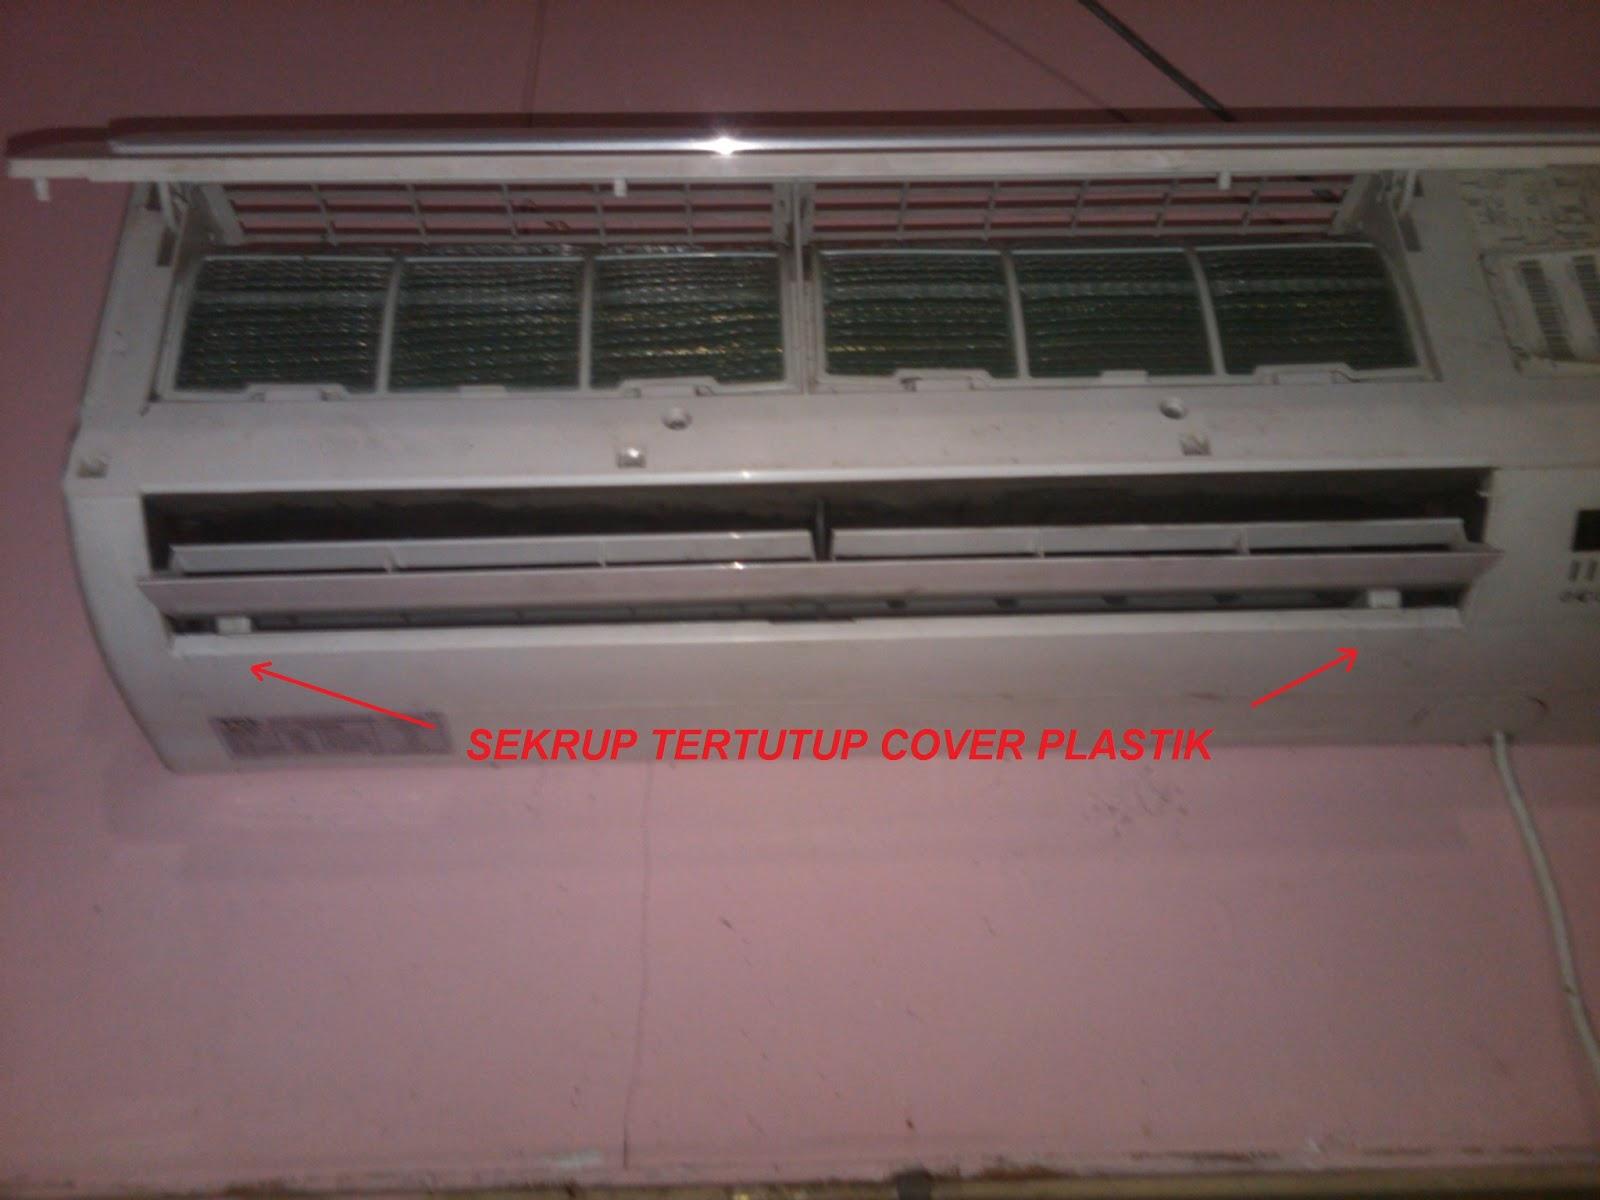 Memperbaiki Ac Split Yang Bocor Jasa Instalasi Dan Service Ac